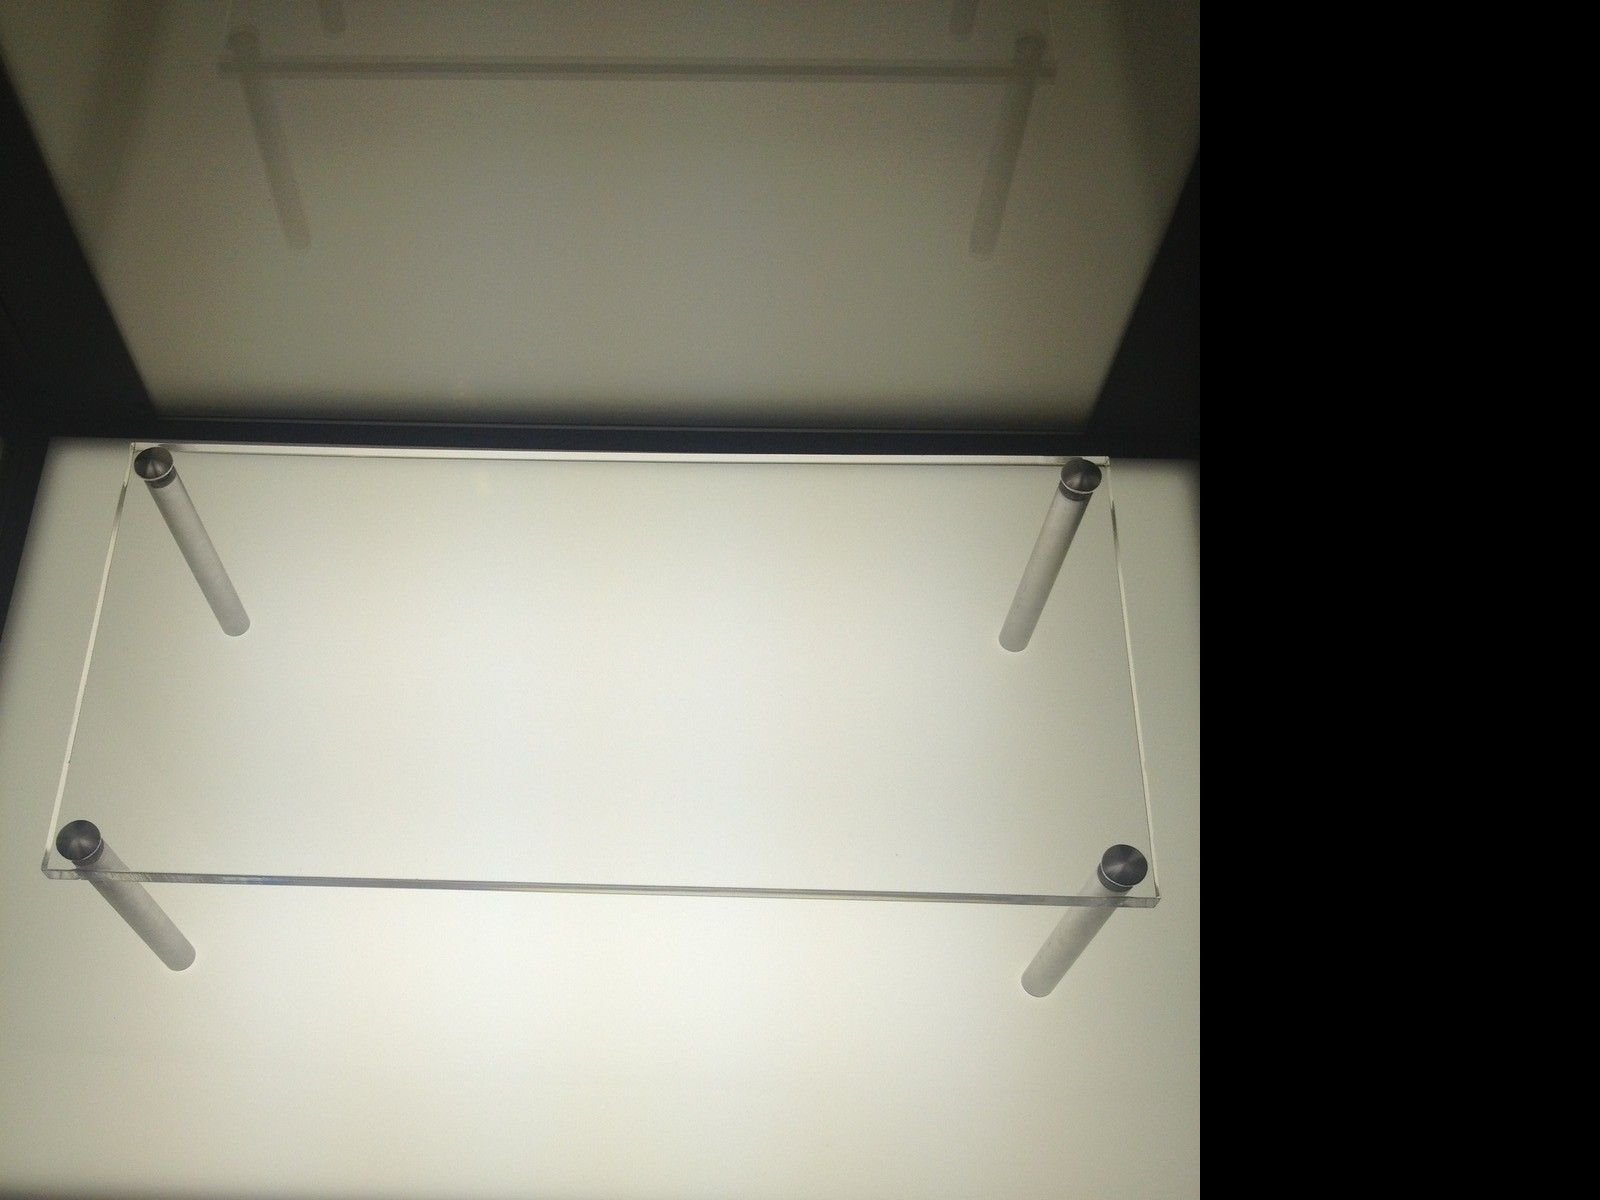 Brand New Oakley Acrylic Display Shelf $65.00 Shipped To USA - oakleyshelf03.jpg